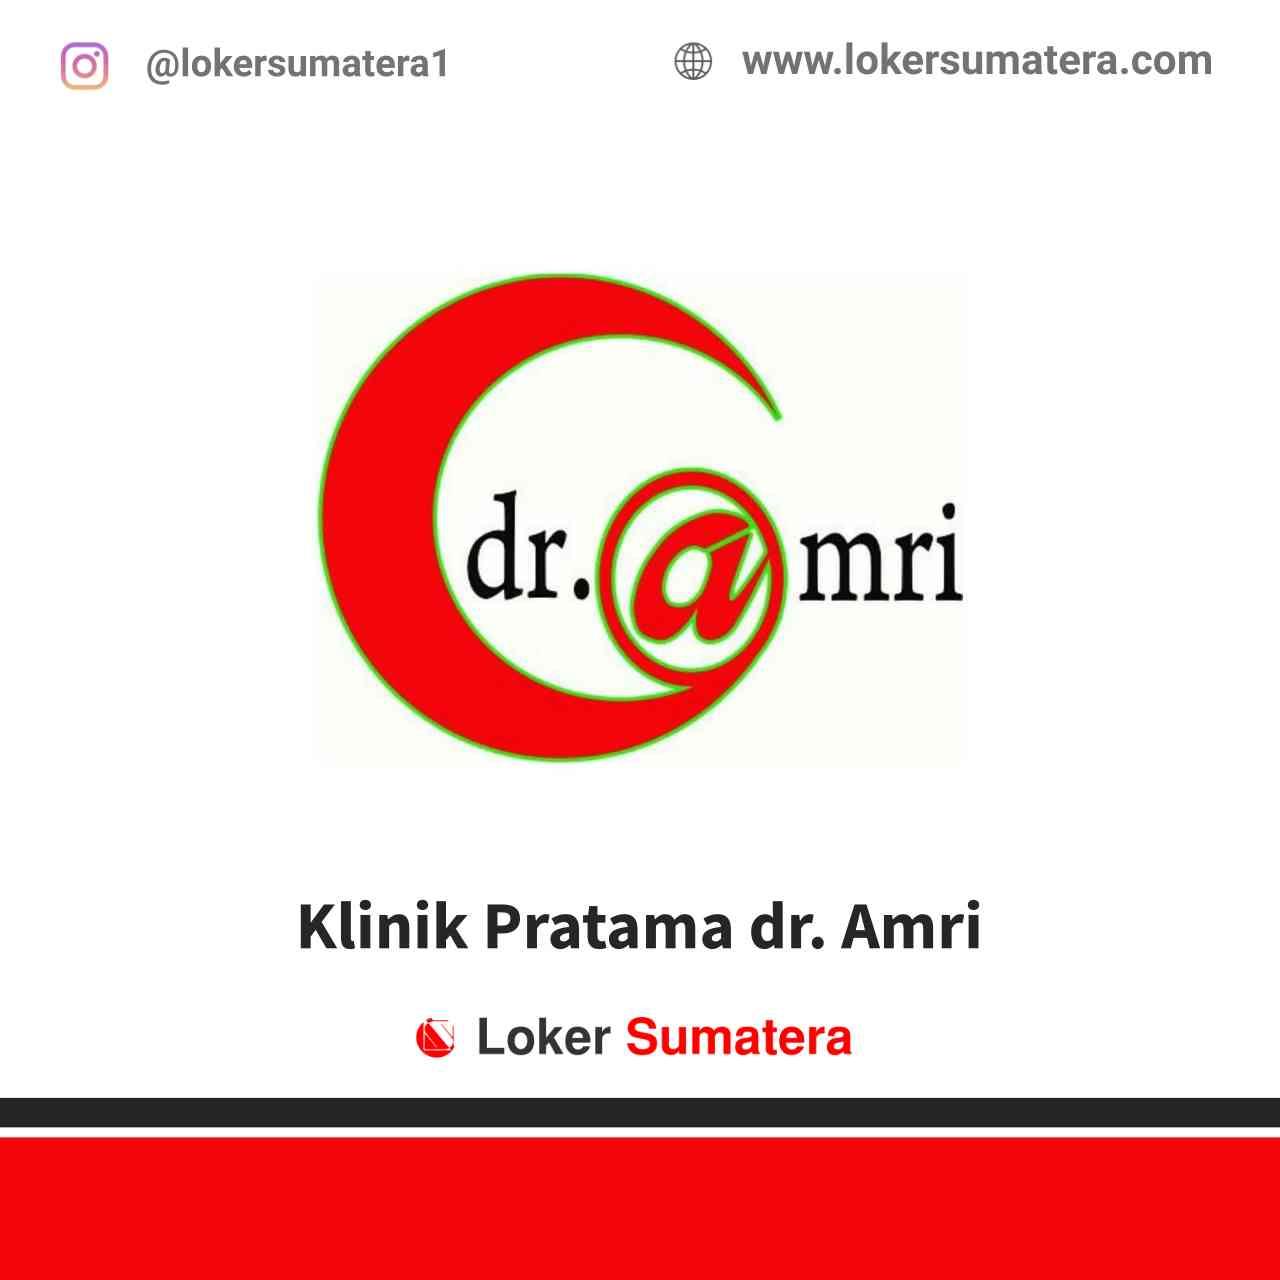 Klinik Pratama dr. Amri Duri